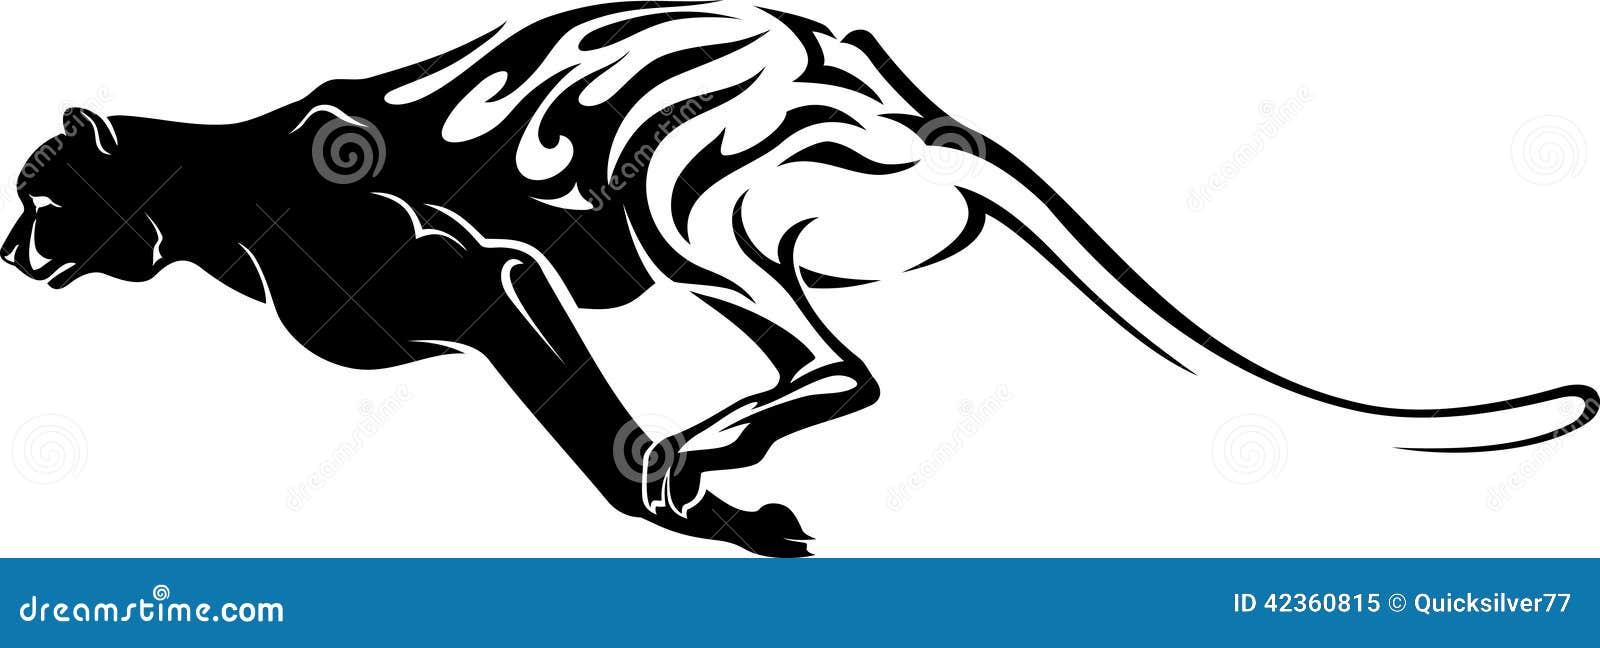 Fast Cheetah Tattoo Stock Illustration Image 42360815